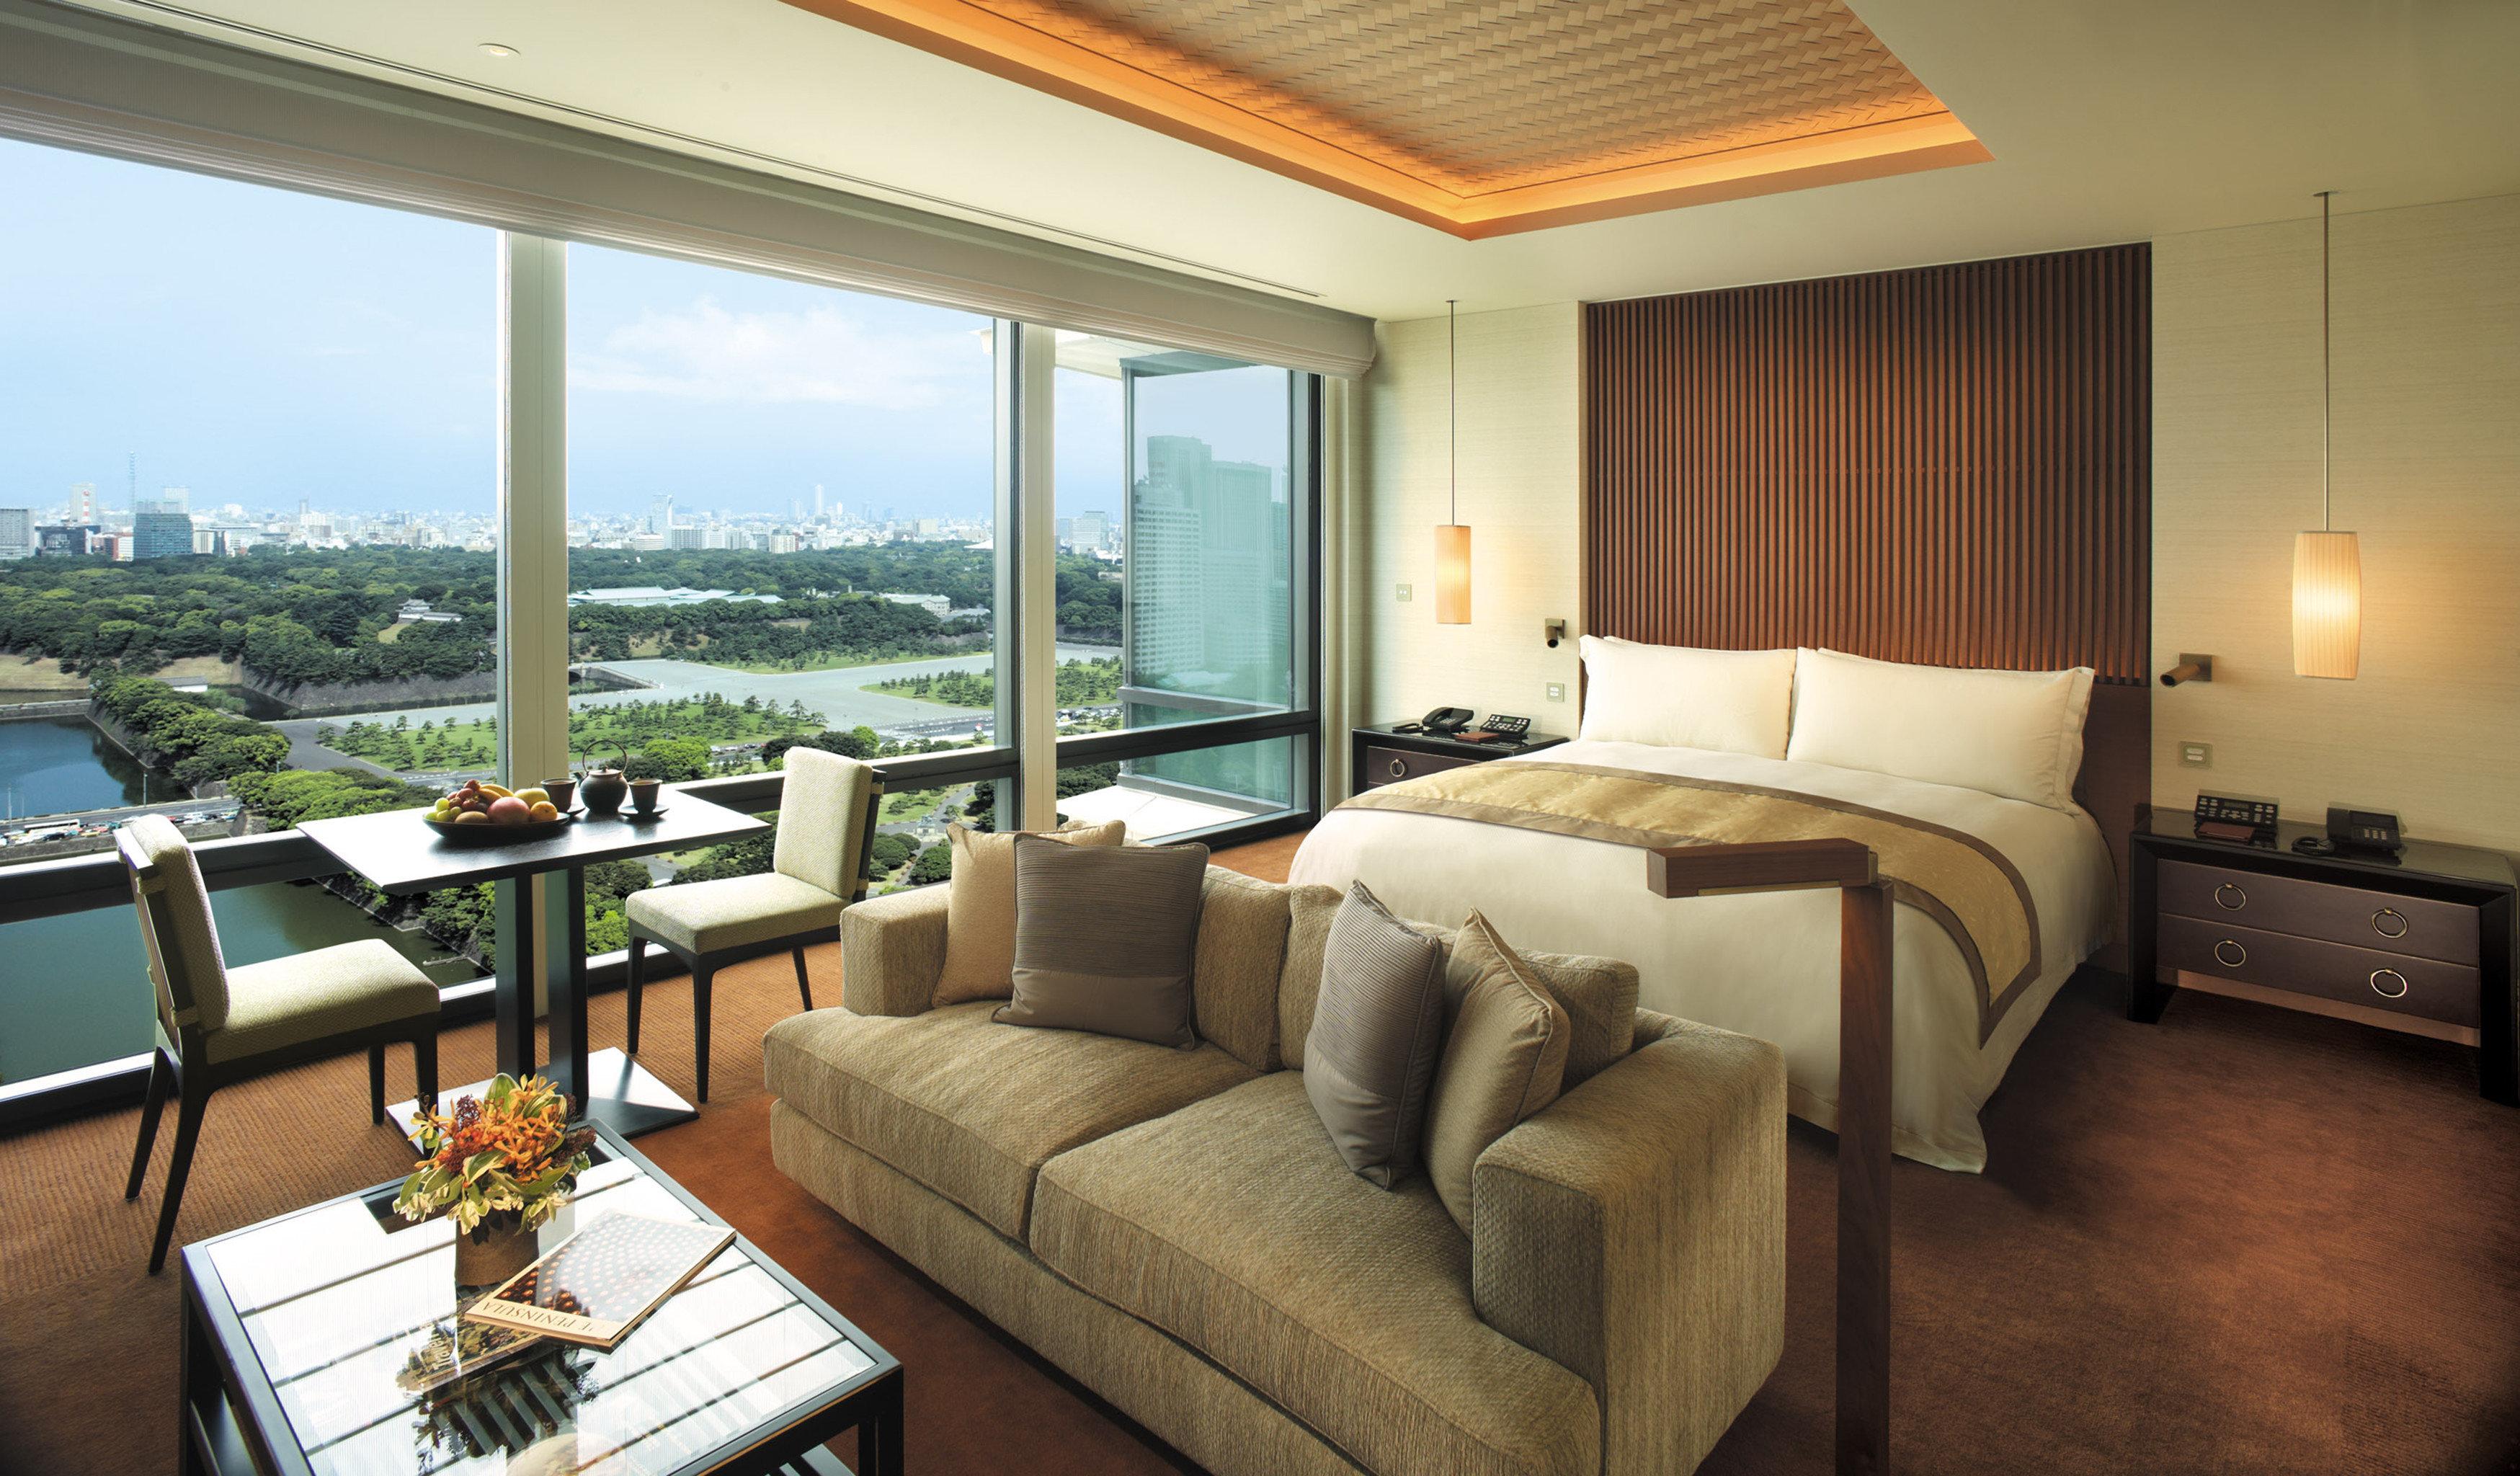 Bedroom City Elegant Luxury Modern Scenic views property Suite condominium Resort Villa cottage home living room overlooking lamp